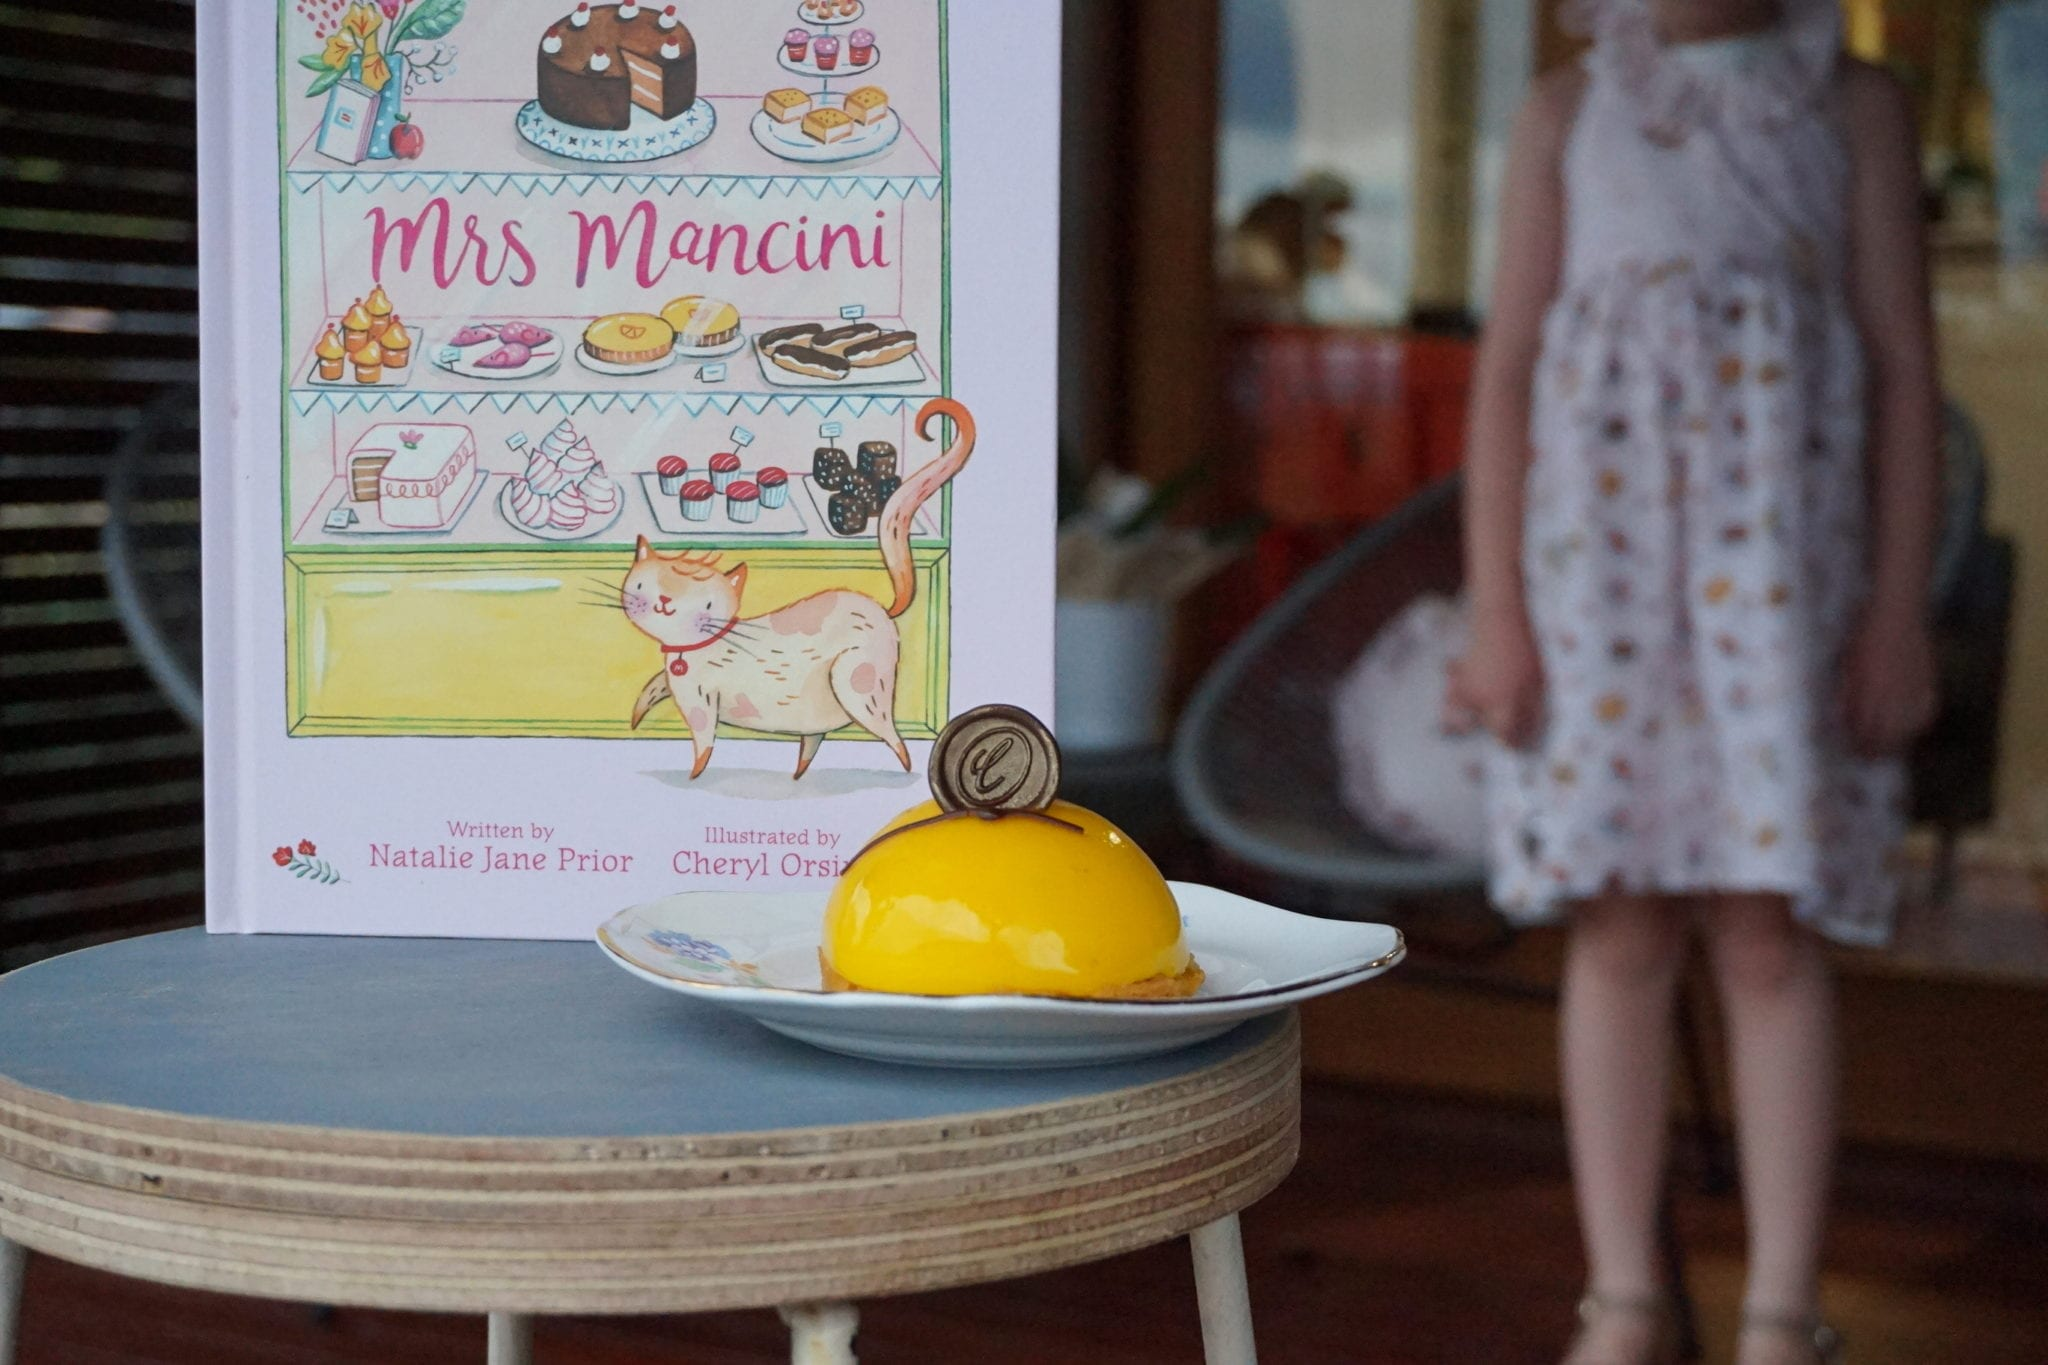 mrs-mancini-with-lemon-curd3